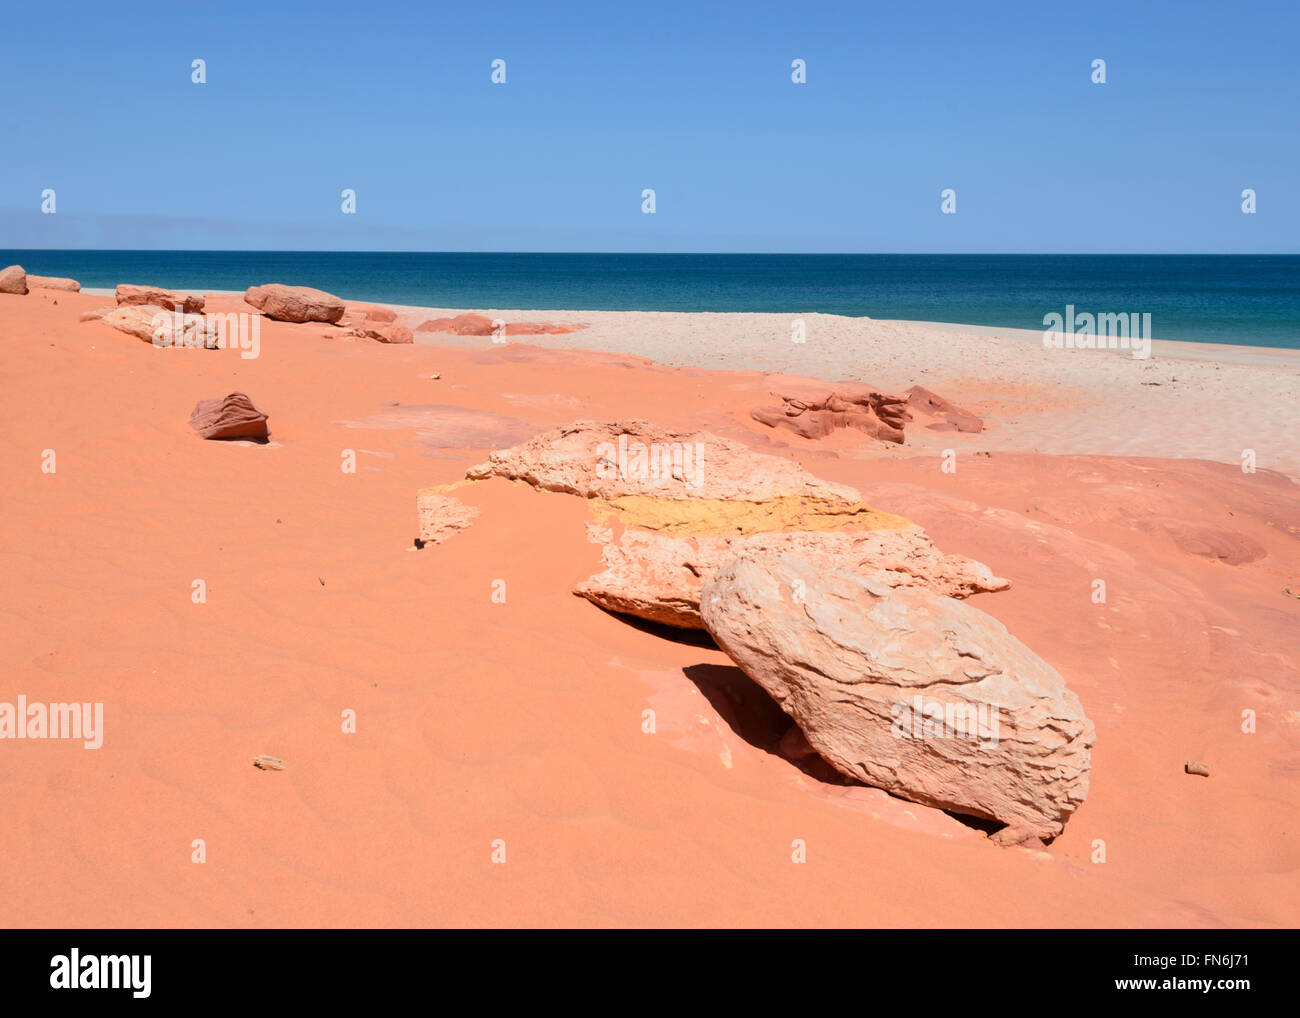 Cape Leveque, Dampier Peninsula, Kimberley Region,  Western Australia, WA, Australia - Stock Image